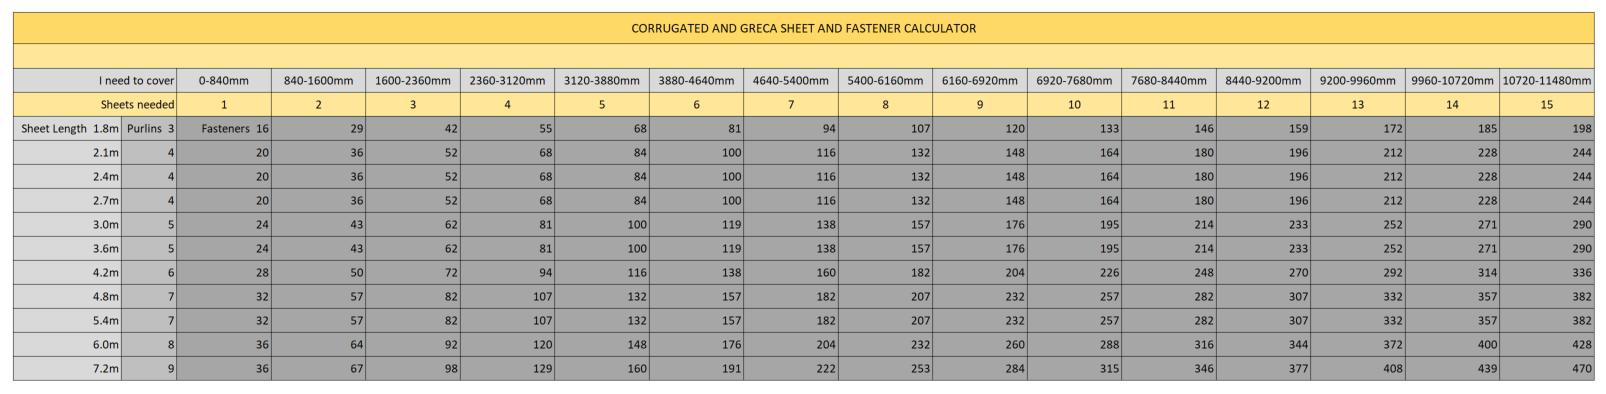 Sunnyside_clear_roofing_sheet_fastener_calculator